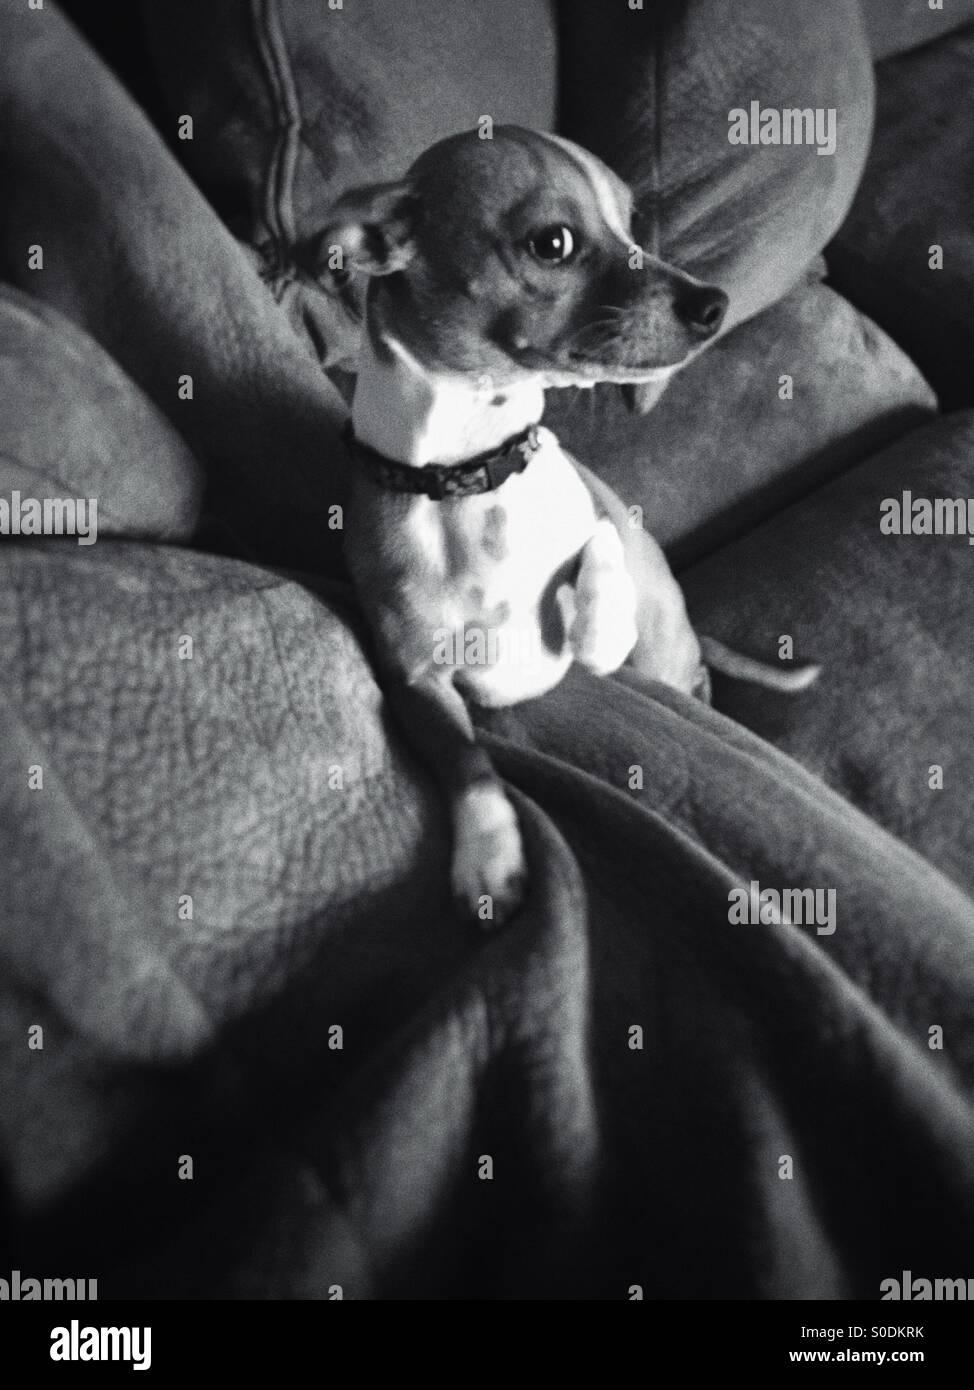 lapdog on a big sofa - Stock Image